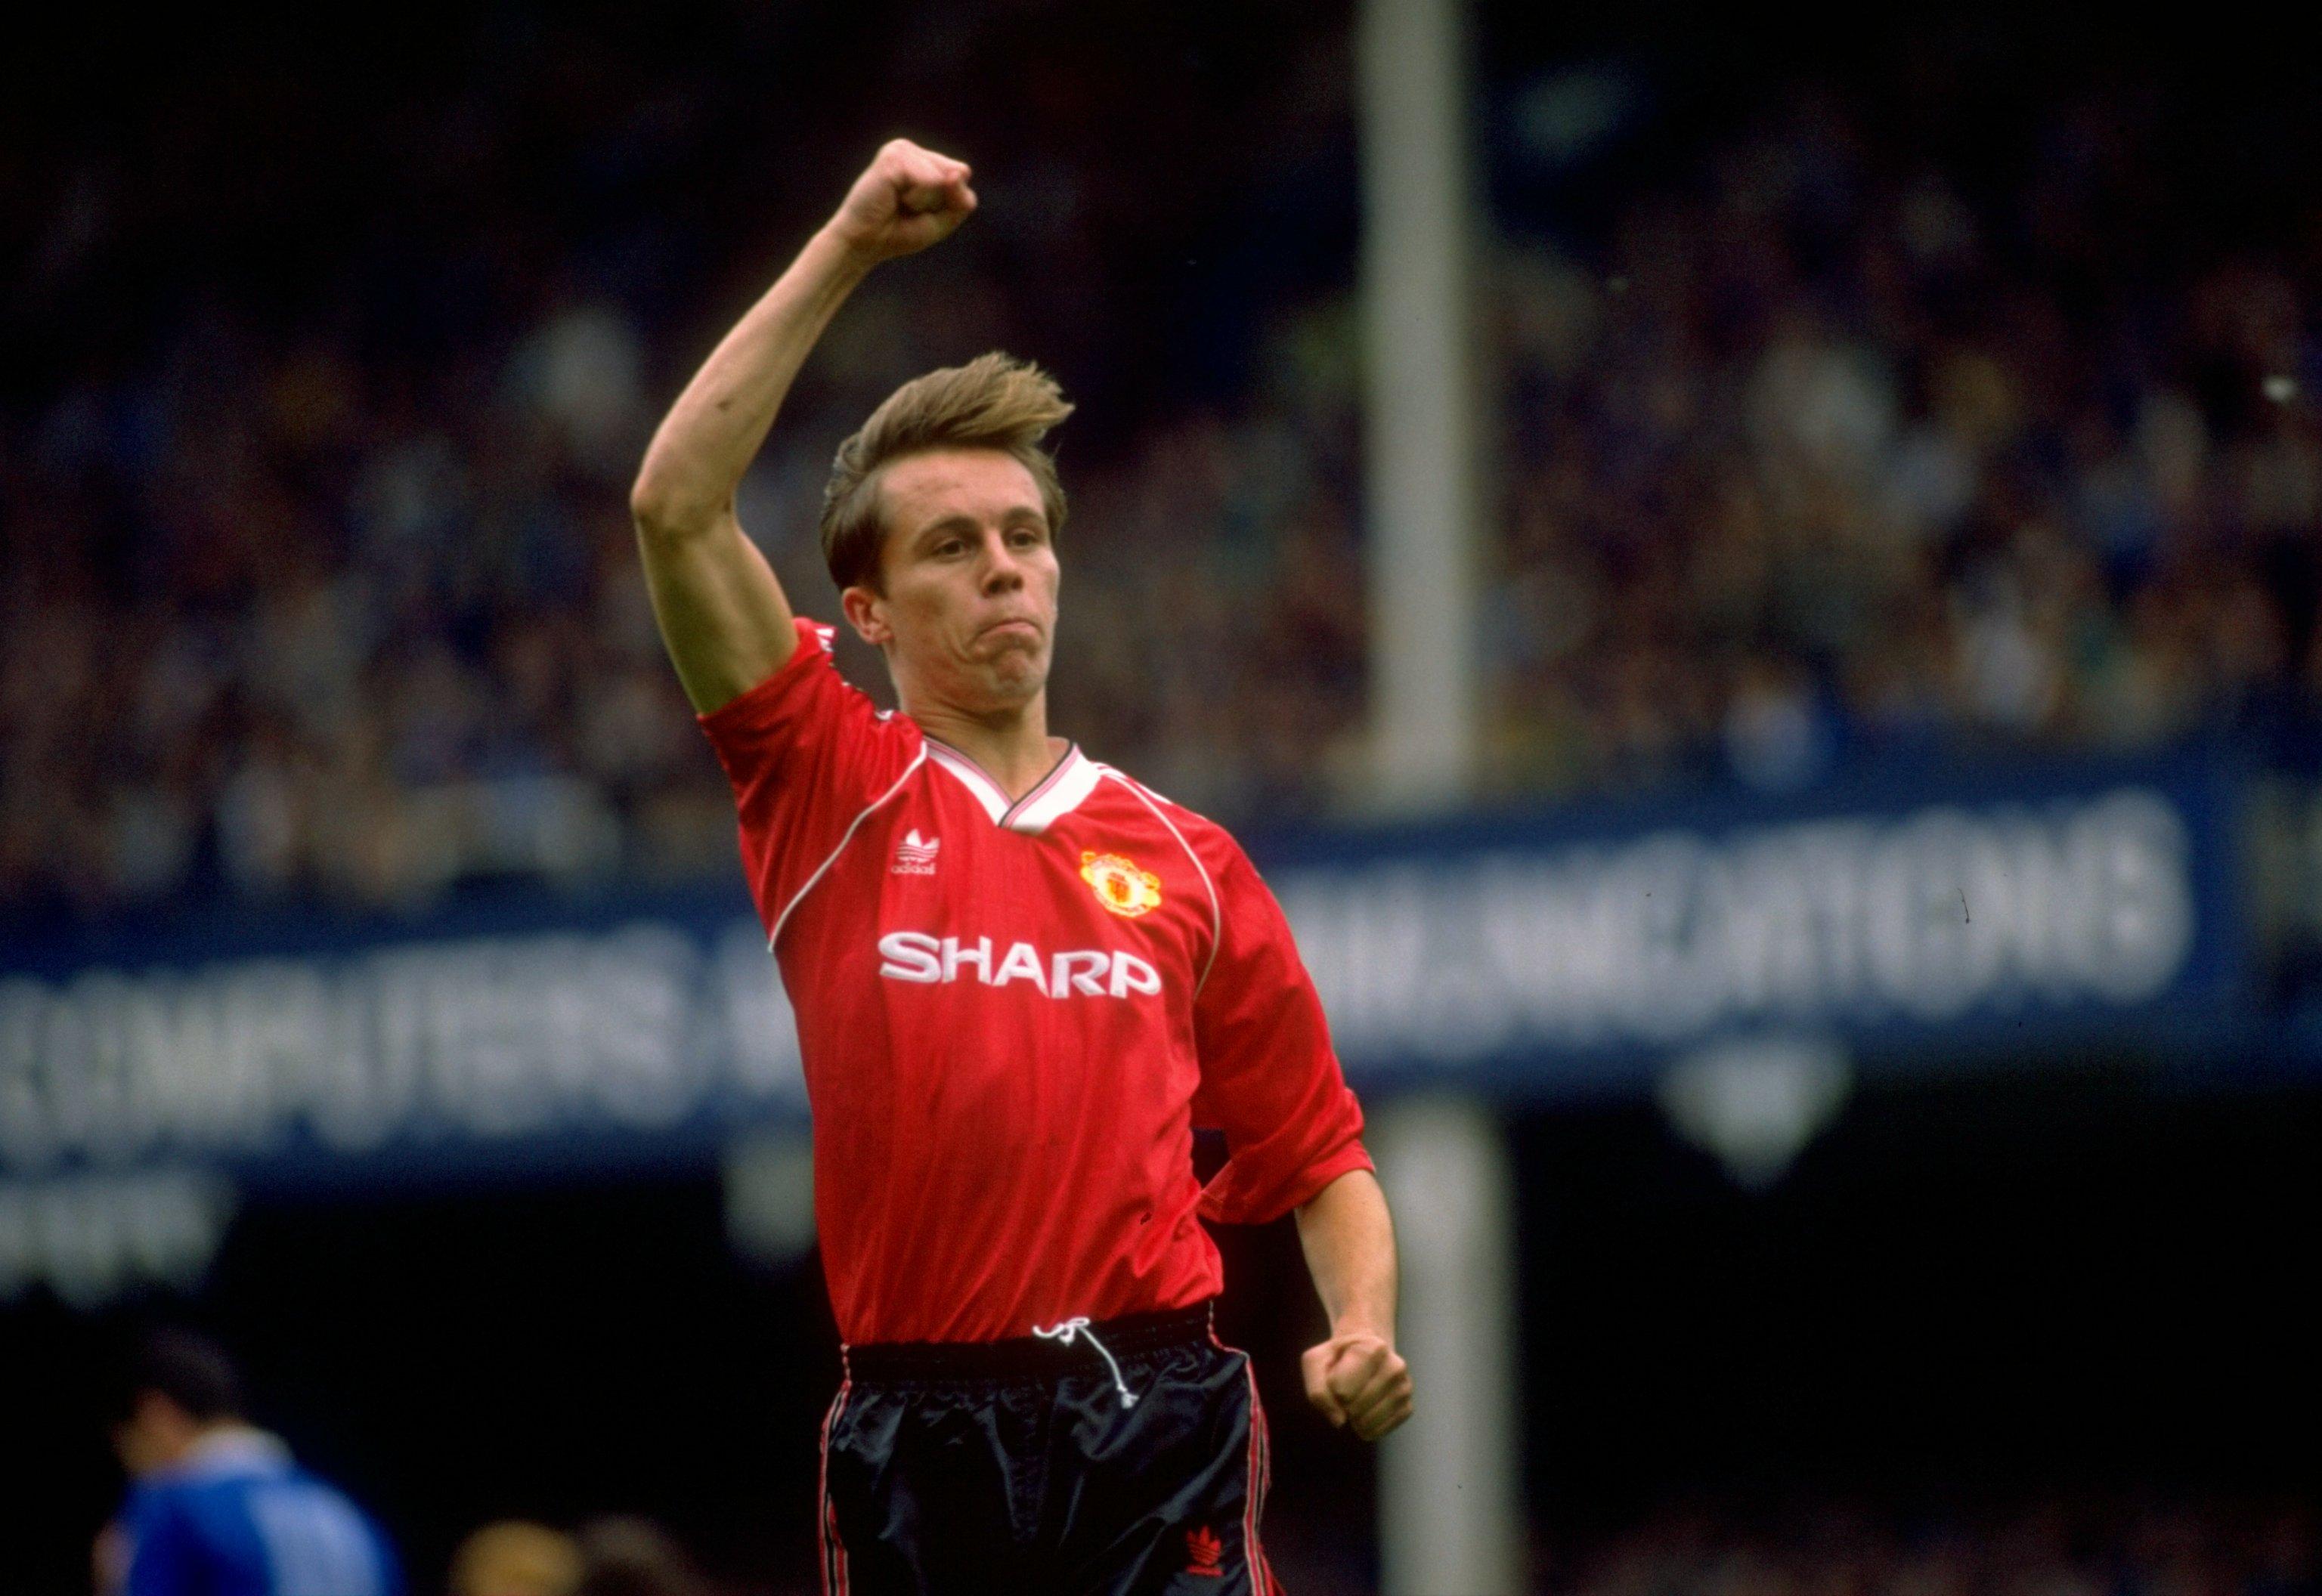 De Gea confident he can remain Man Utd's number one goalkeeper